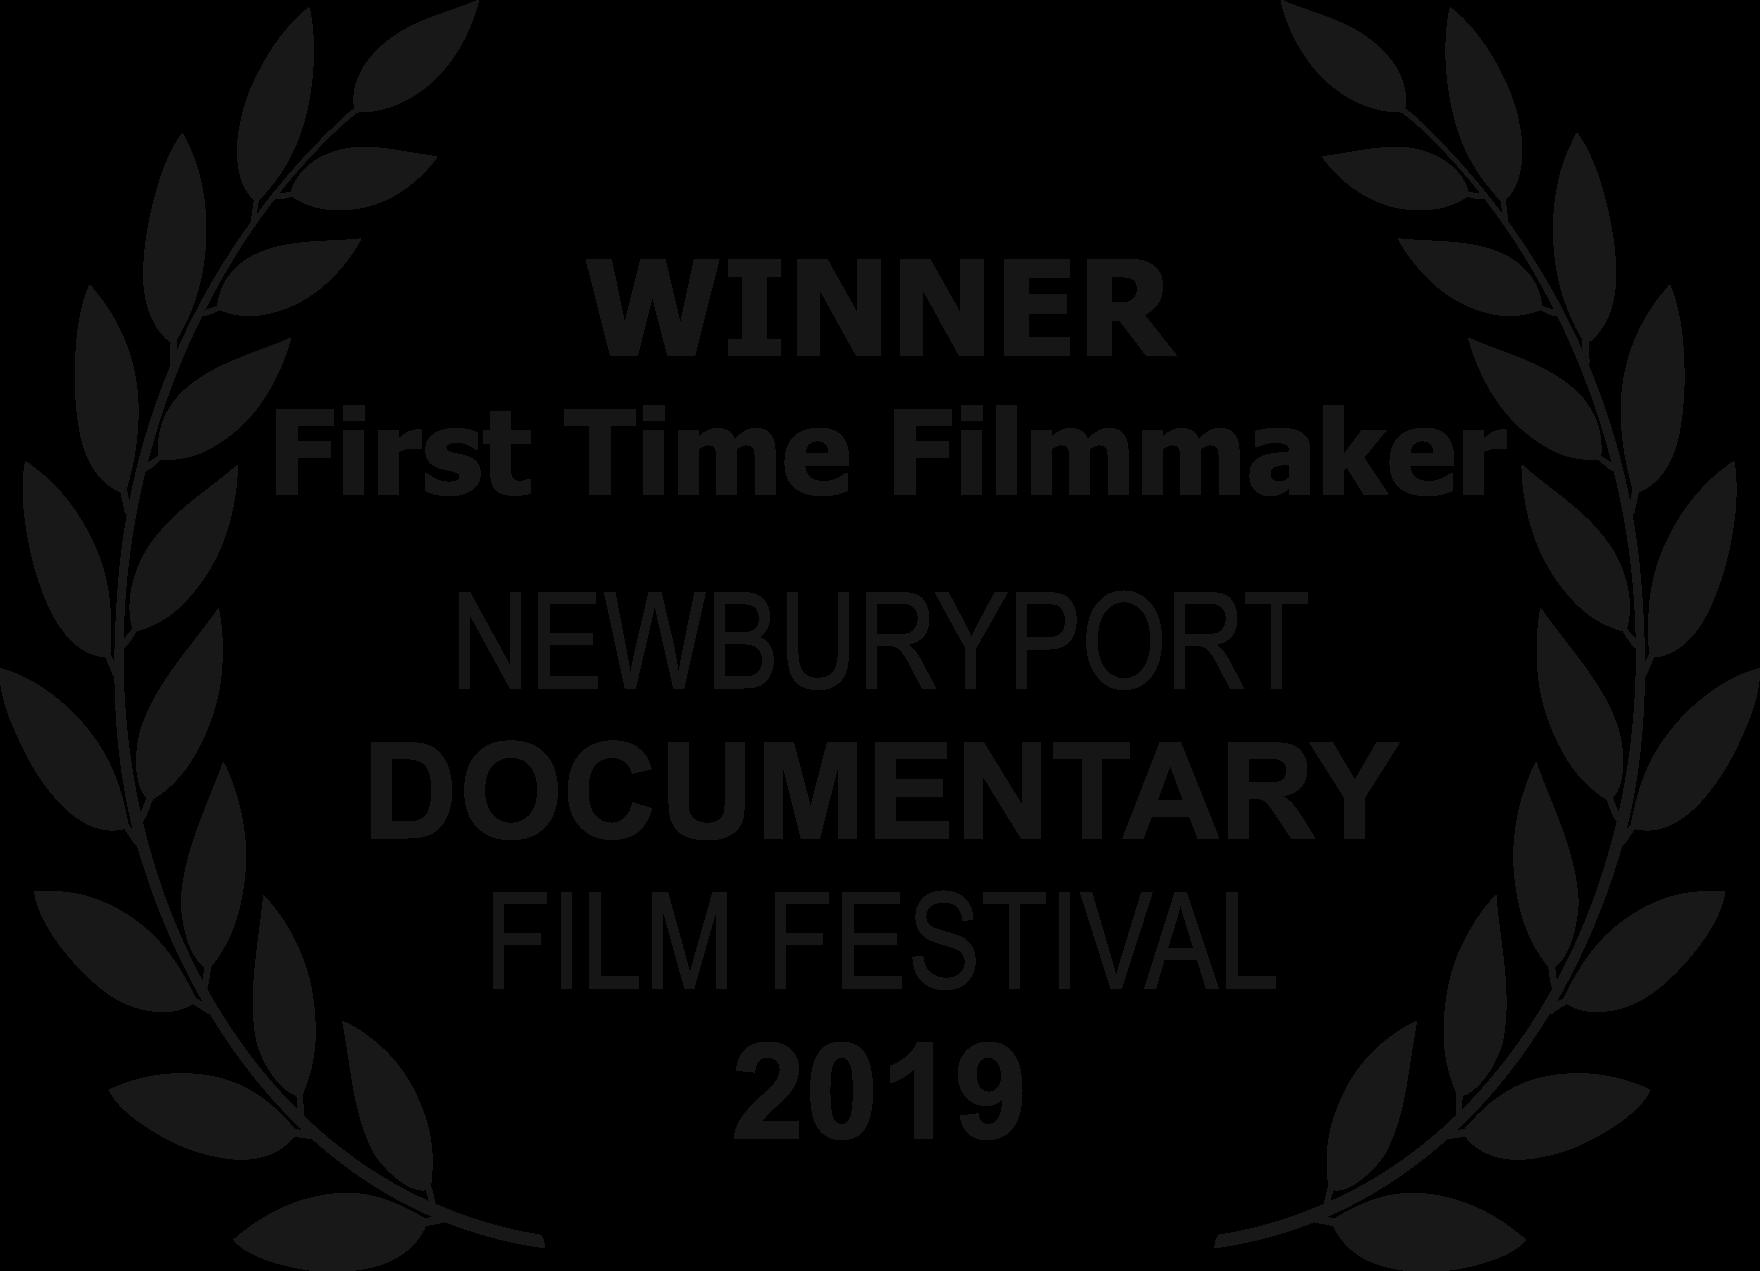 NDFF_2019_Awards_Best First-Time Filmmaker_Black.png